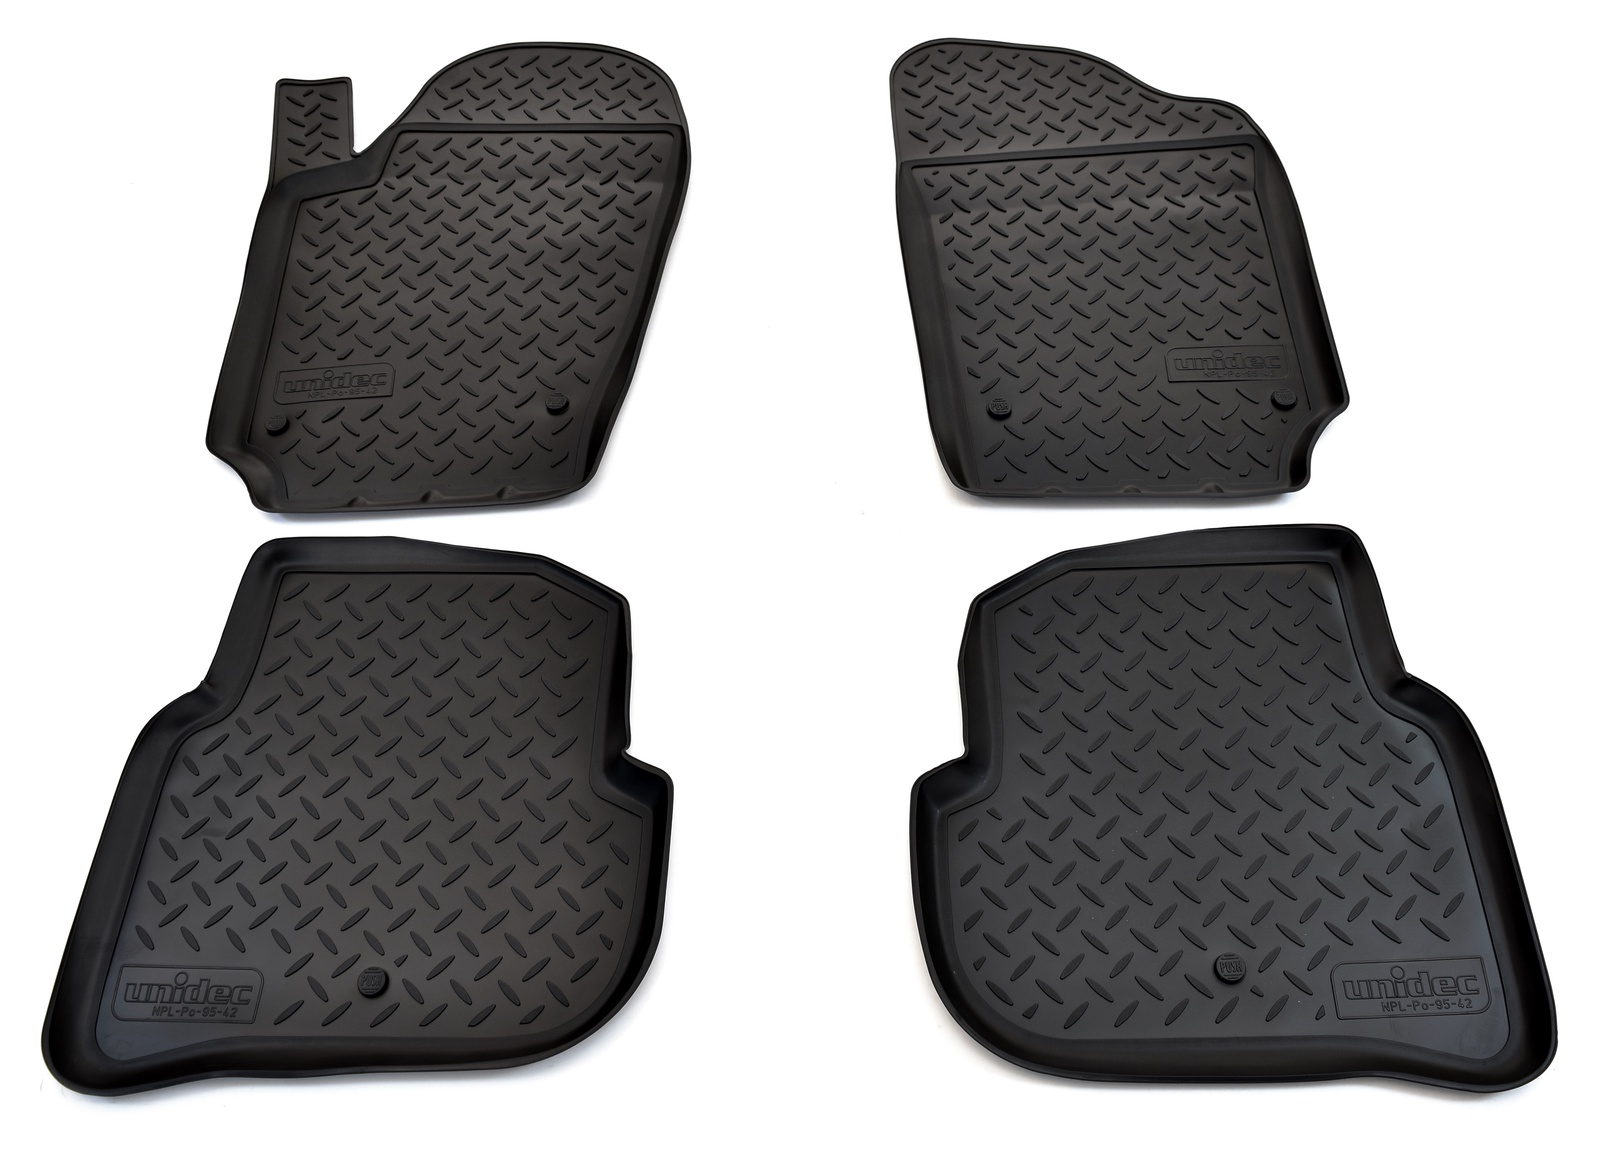 цена на Коврики в салон автомобиля Norplast для Volkswagen Polo (SD) (2010), NPL-Po-95-42, черный